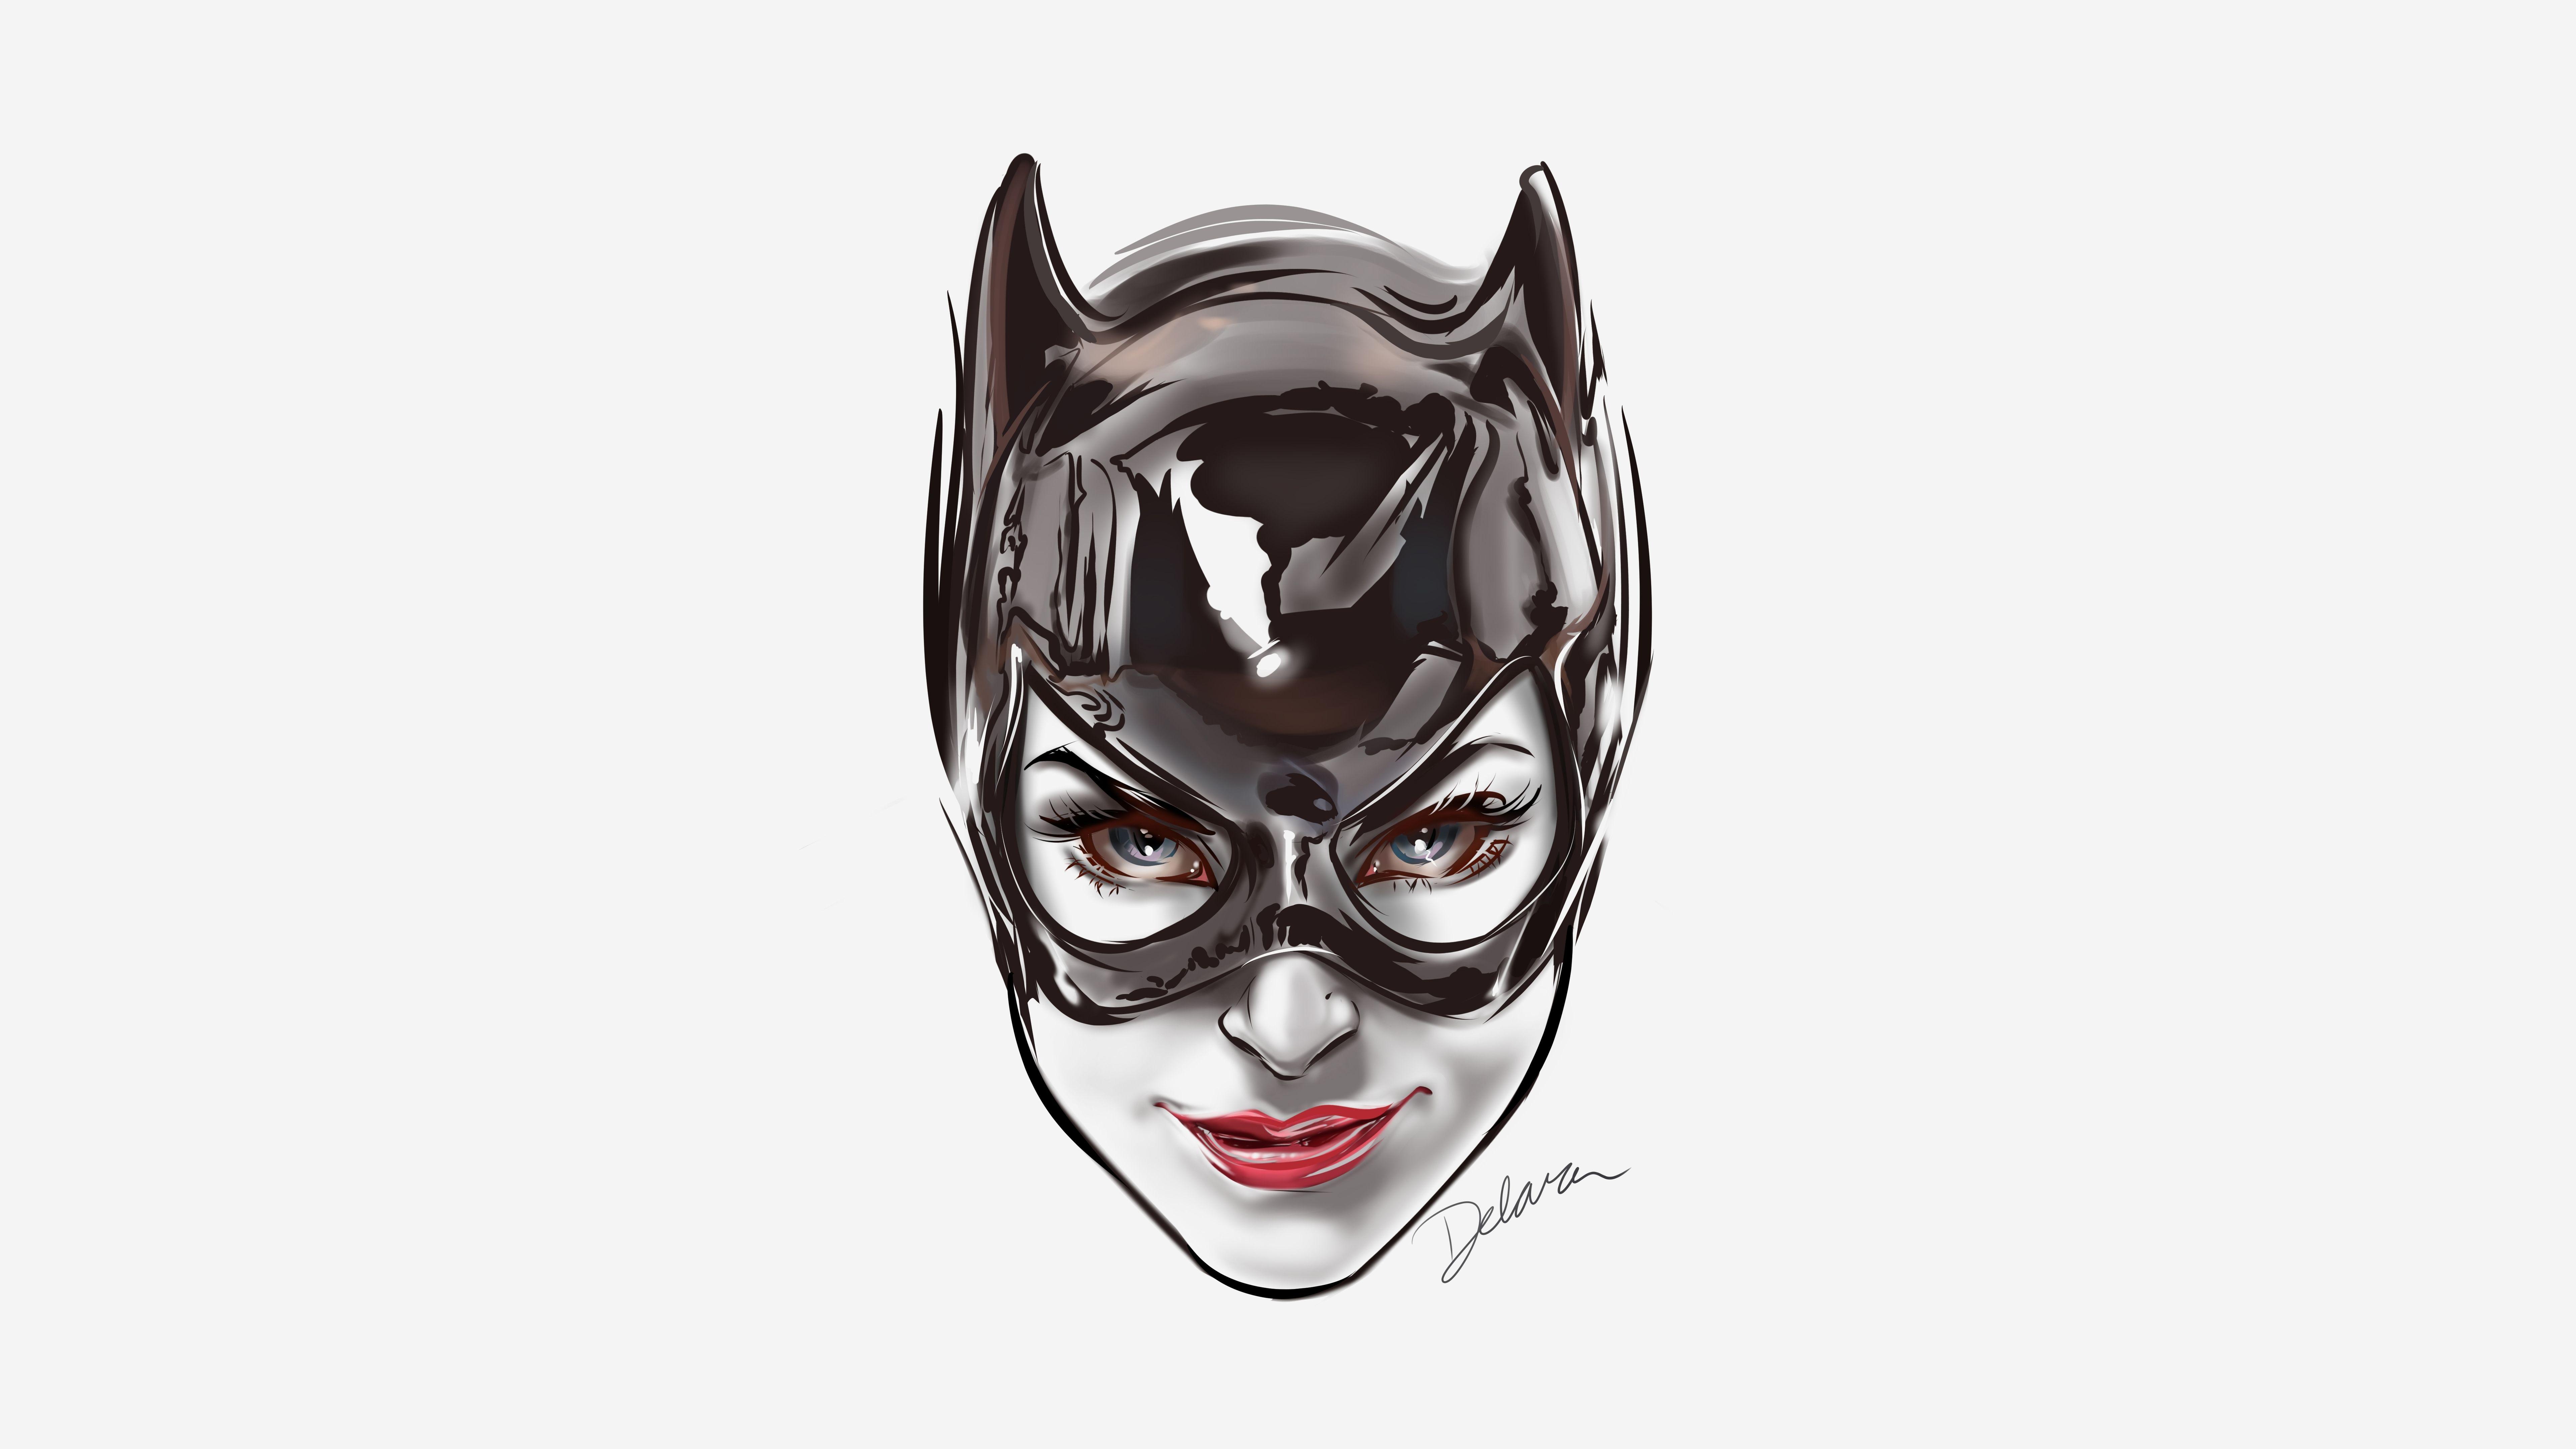 Catwoman Face Artwork 8k Iphone X Wallpaper Catwoman